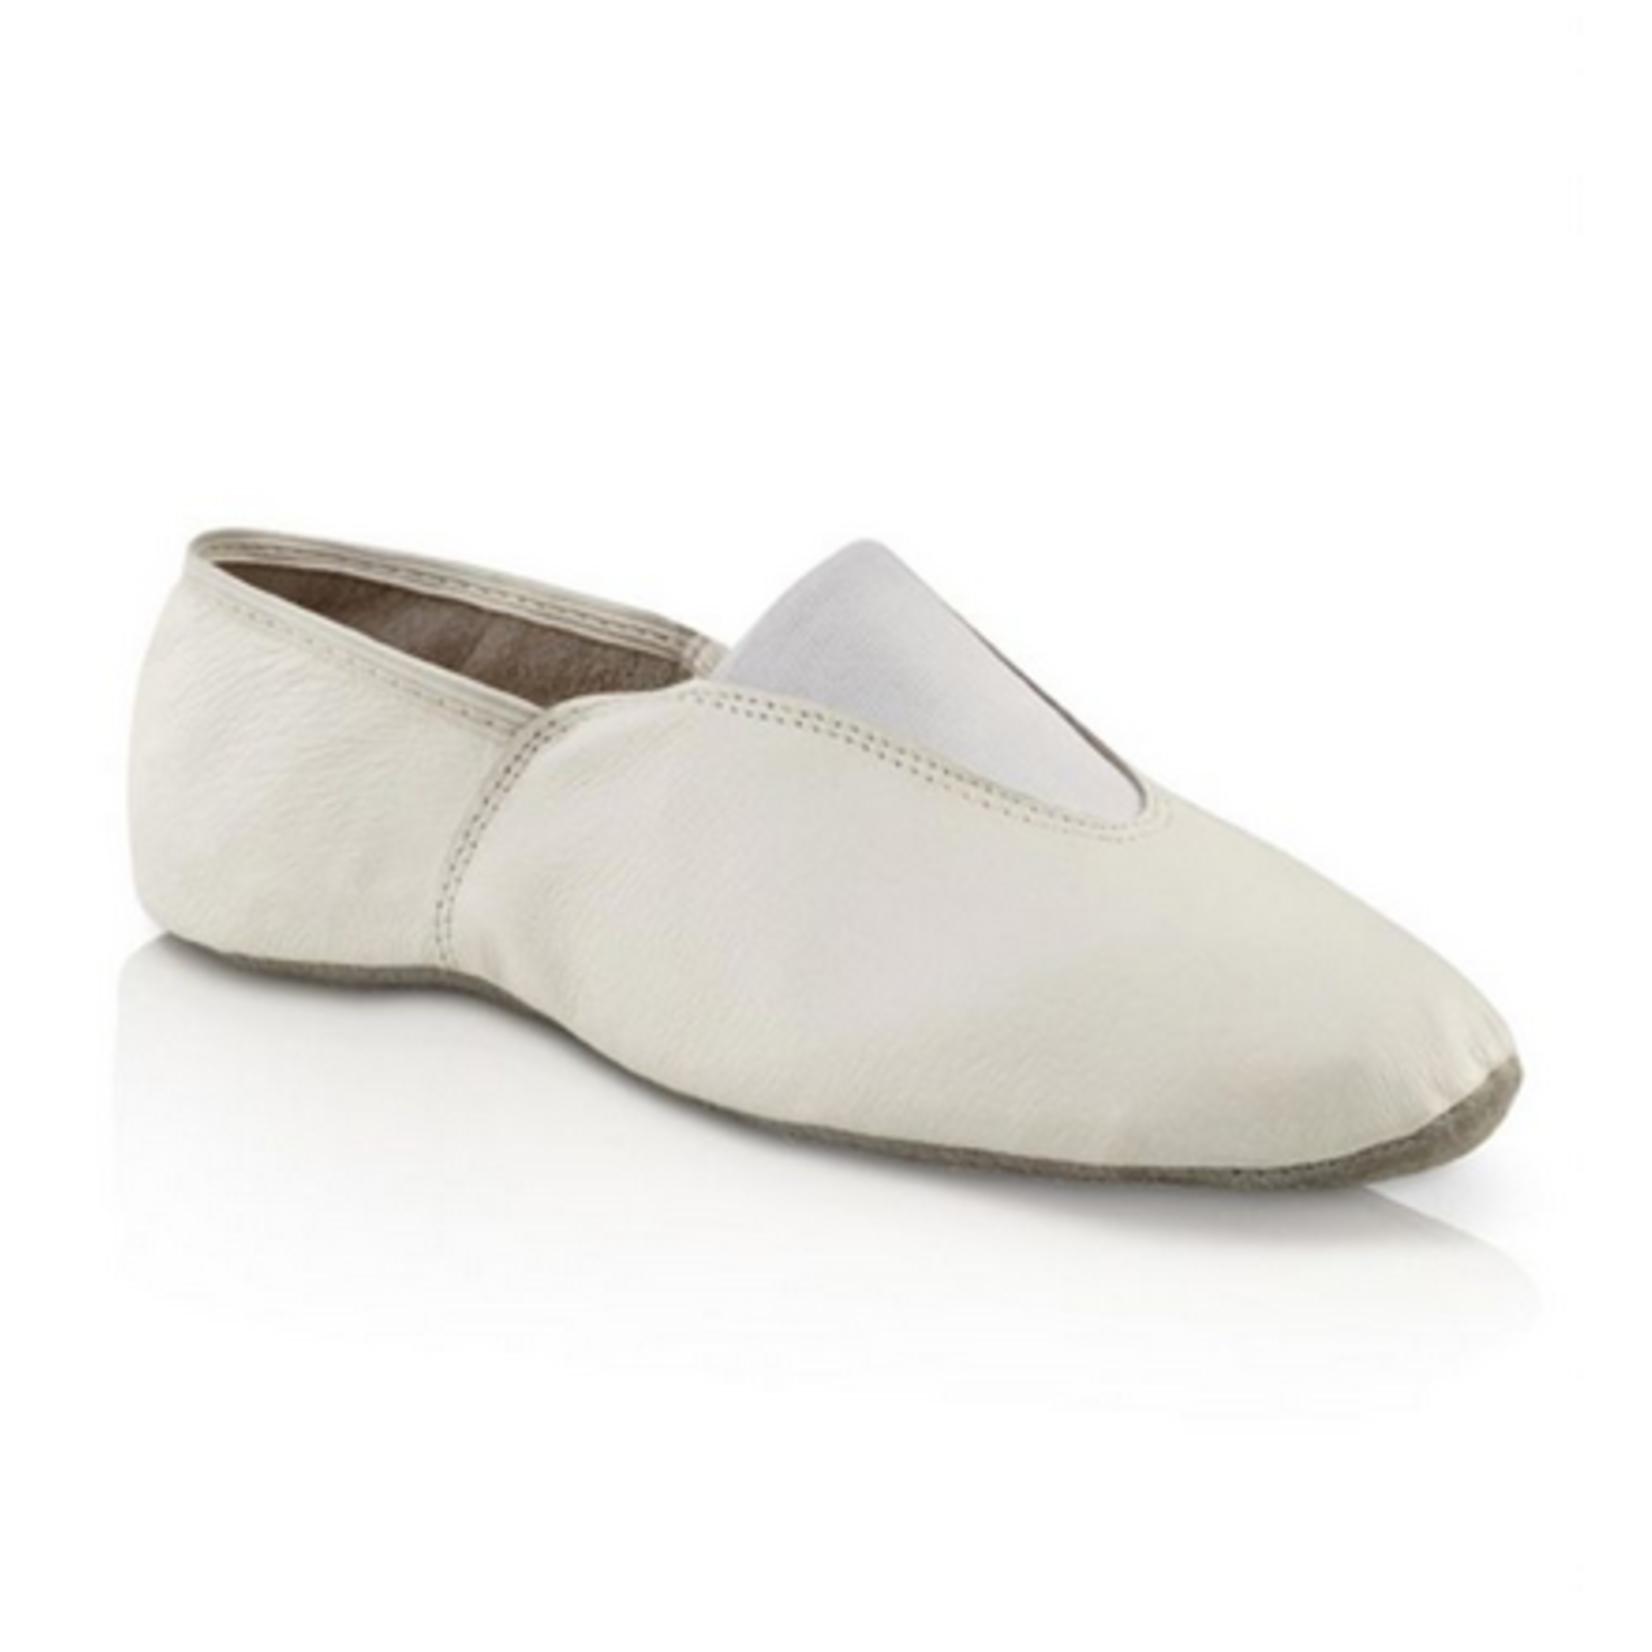 Capezio Capezio EM1 Gymnastics Shoe